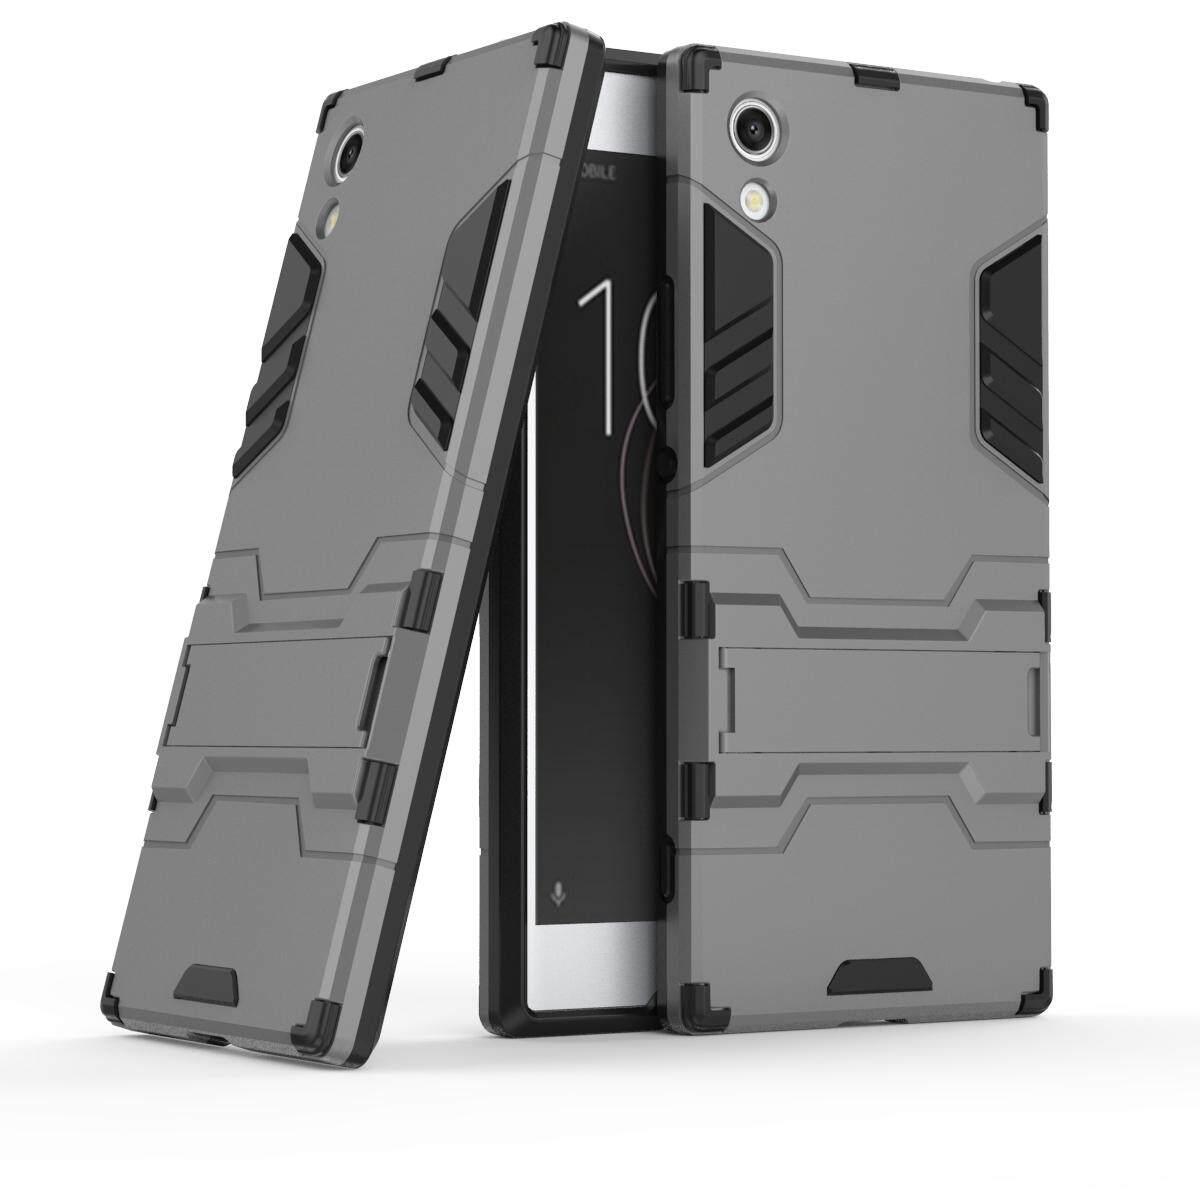 "Untuk Xperia XA1 Case 5.0 ""Keras PVC + Penutup Karet Kickstand untuk Sony Z6 G3121 G3123 G3125 G3112 G3116"